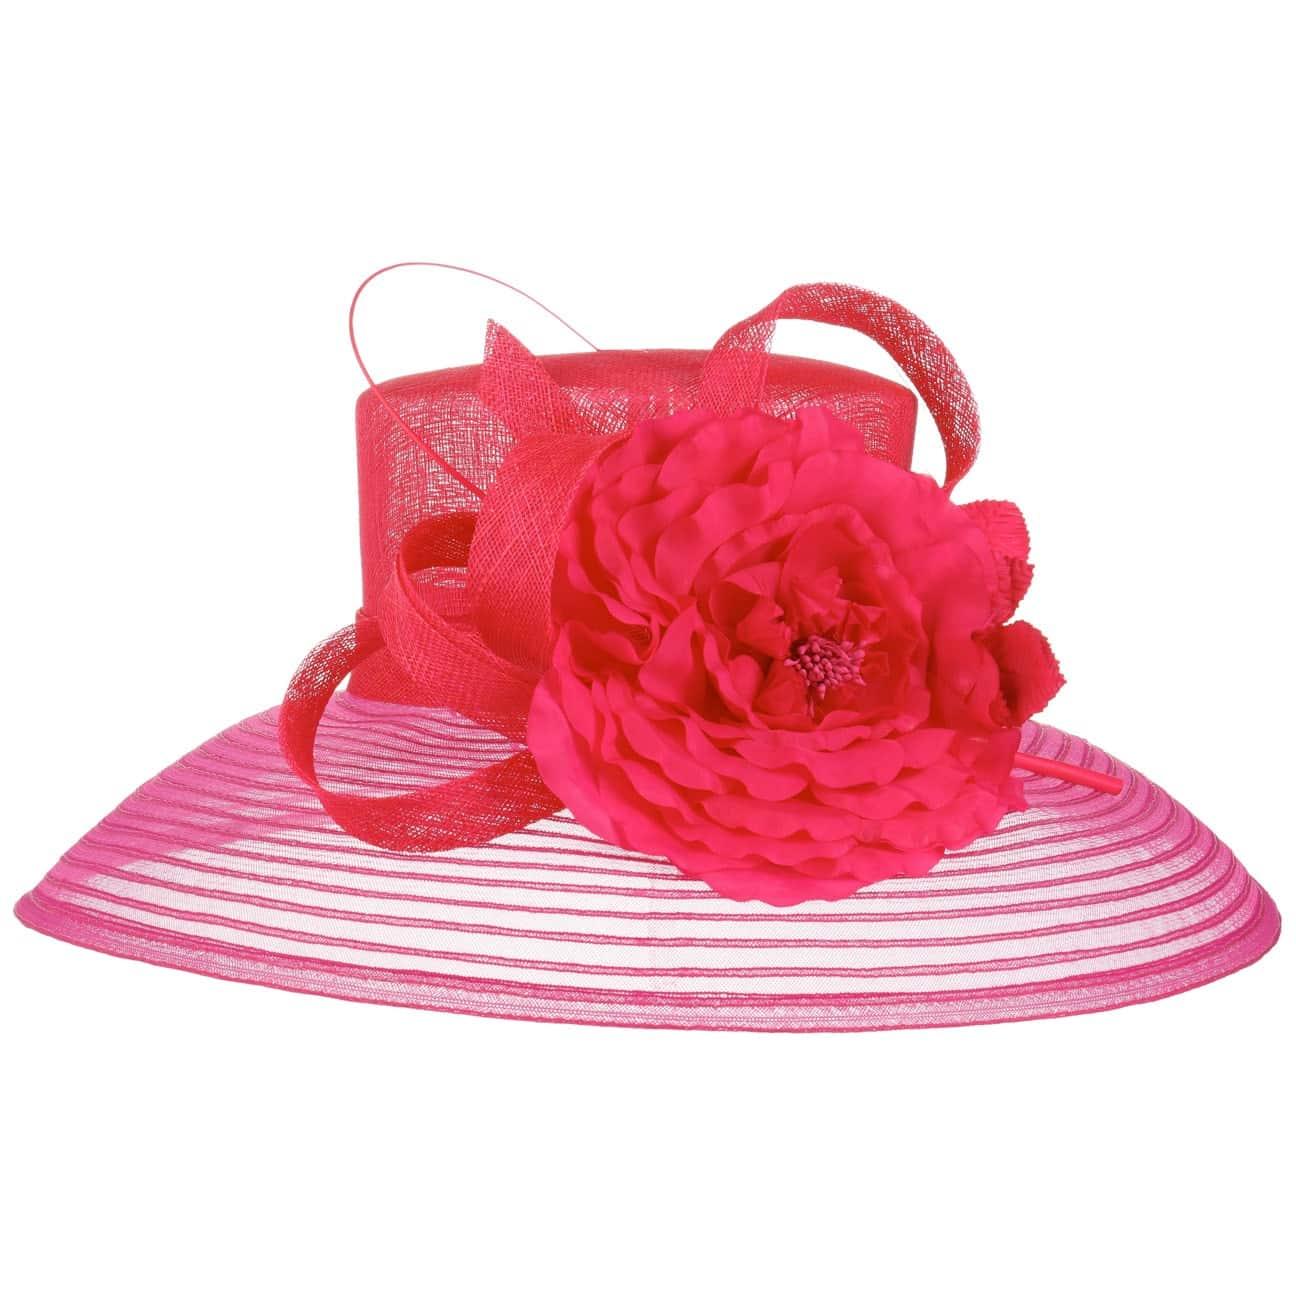 Sombrero de Ocasi?n Summertime by Maja Prinzessin von Hohenzollern